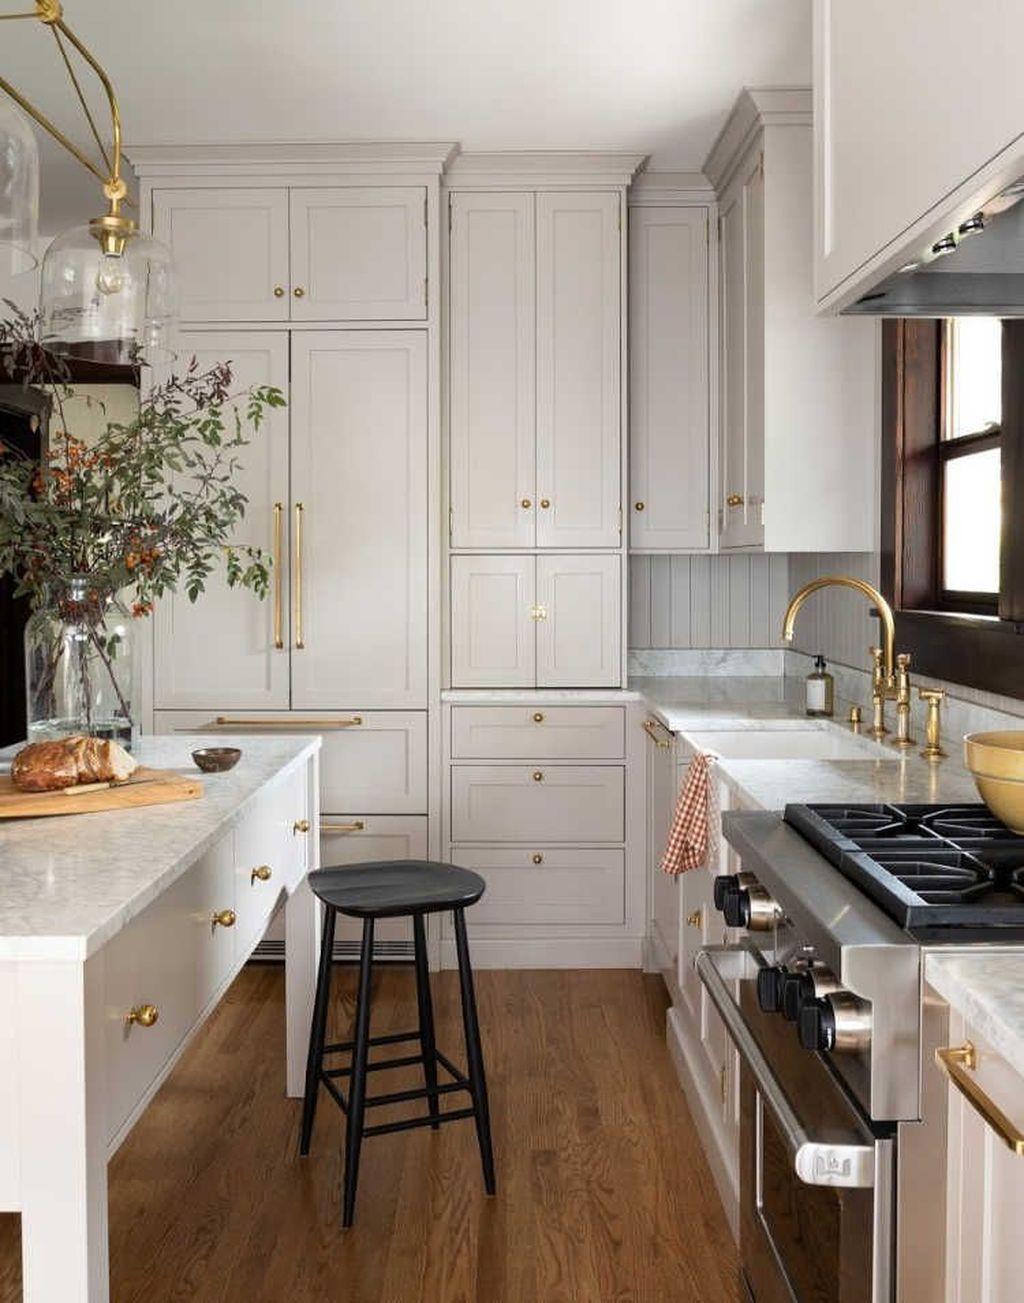 40 Incredible Colorful Kitchen Ideas In 2020 Kitchen Cabinet Design Diy Kitchen Renovation Craftsman Kitchen Cabinets